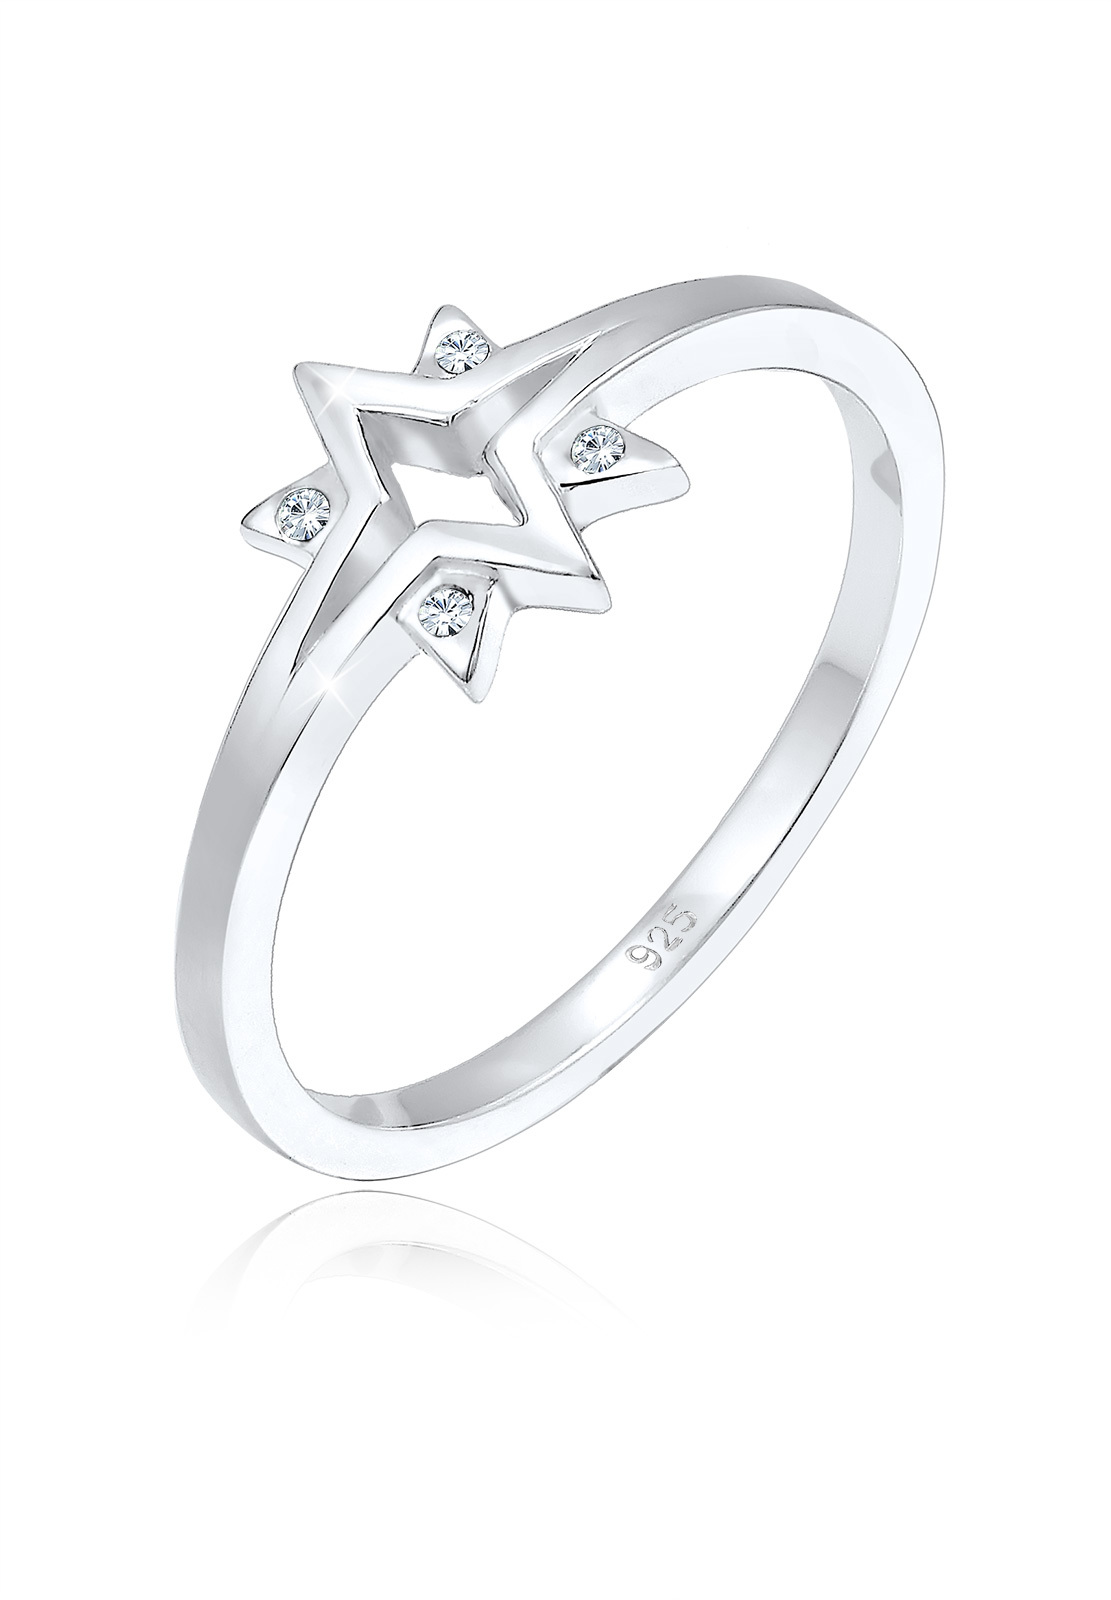 Ring Astro | Kristall ( Weiß ) | 925er Sterling Silber